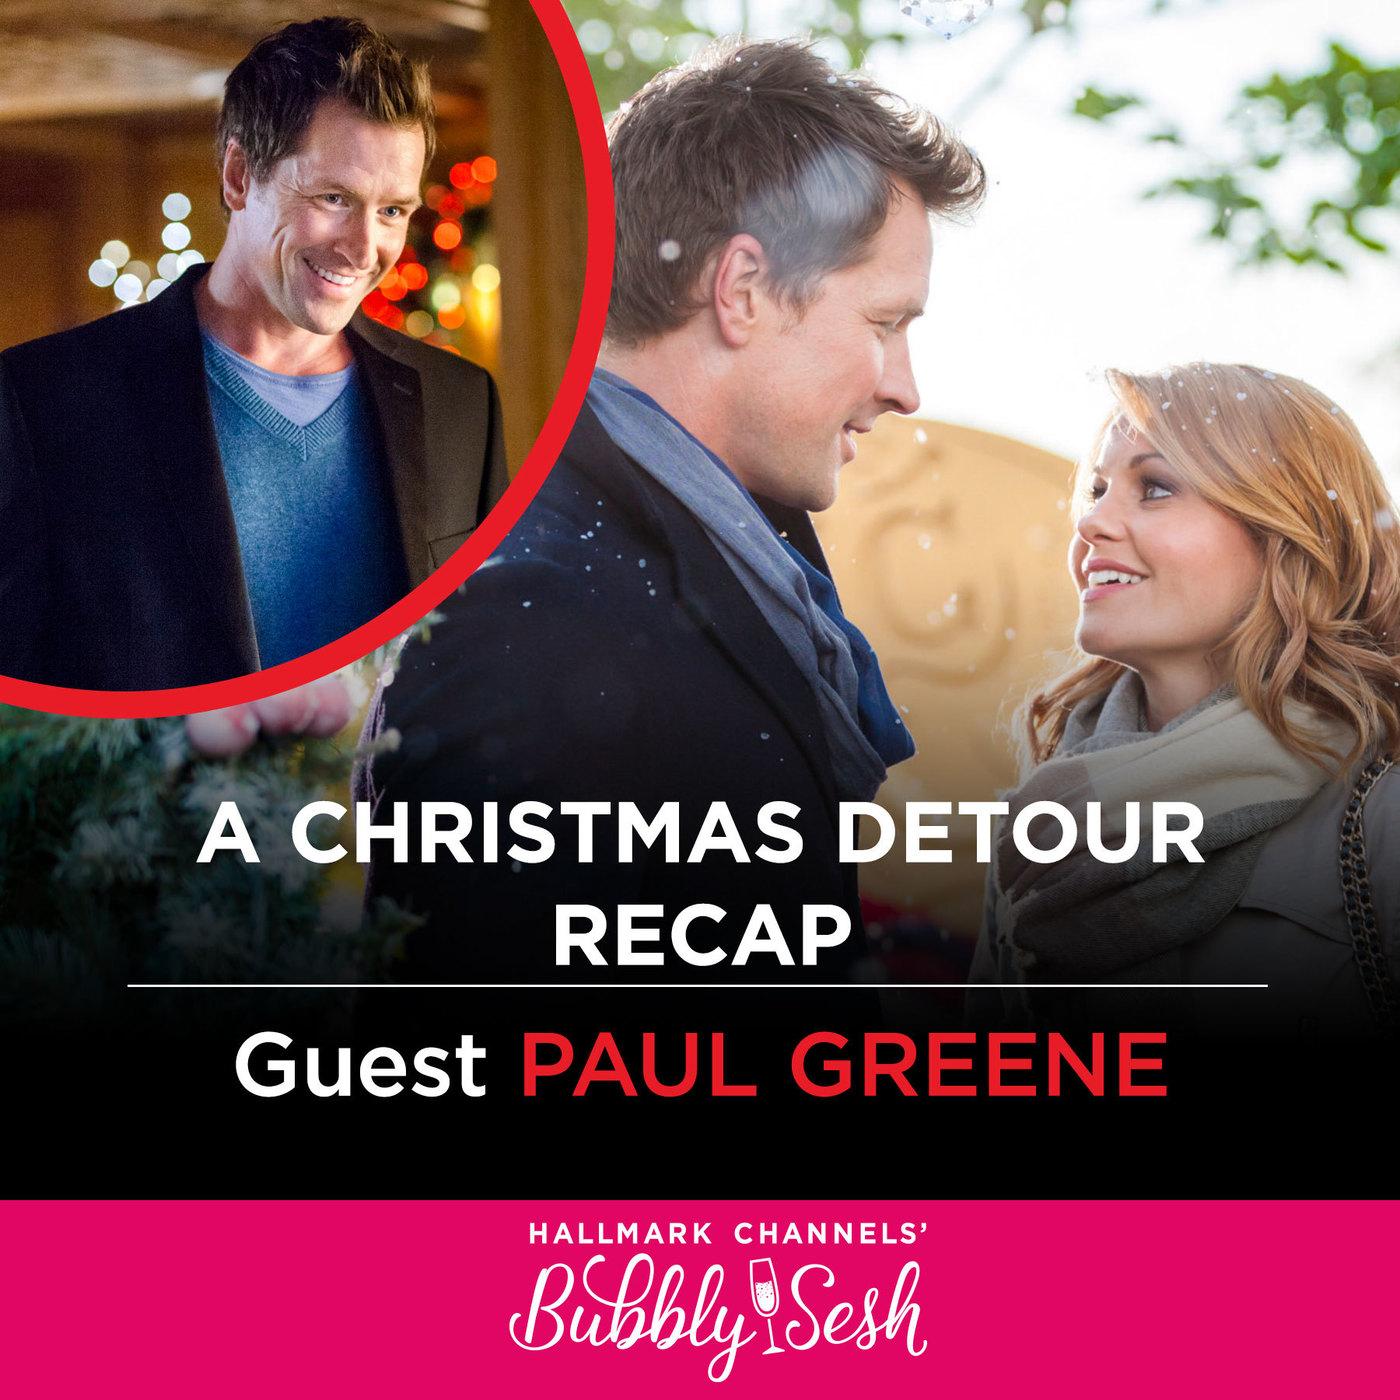 A Christmas Detour Recap with Guest Paul Greene